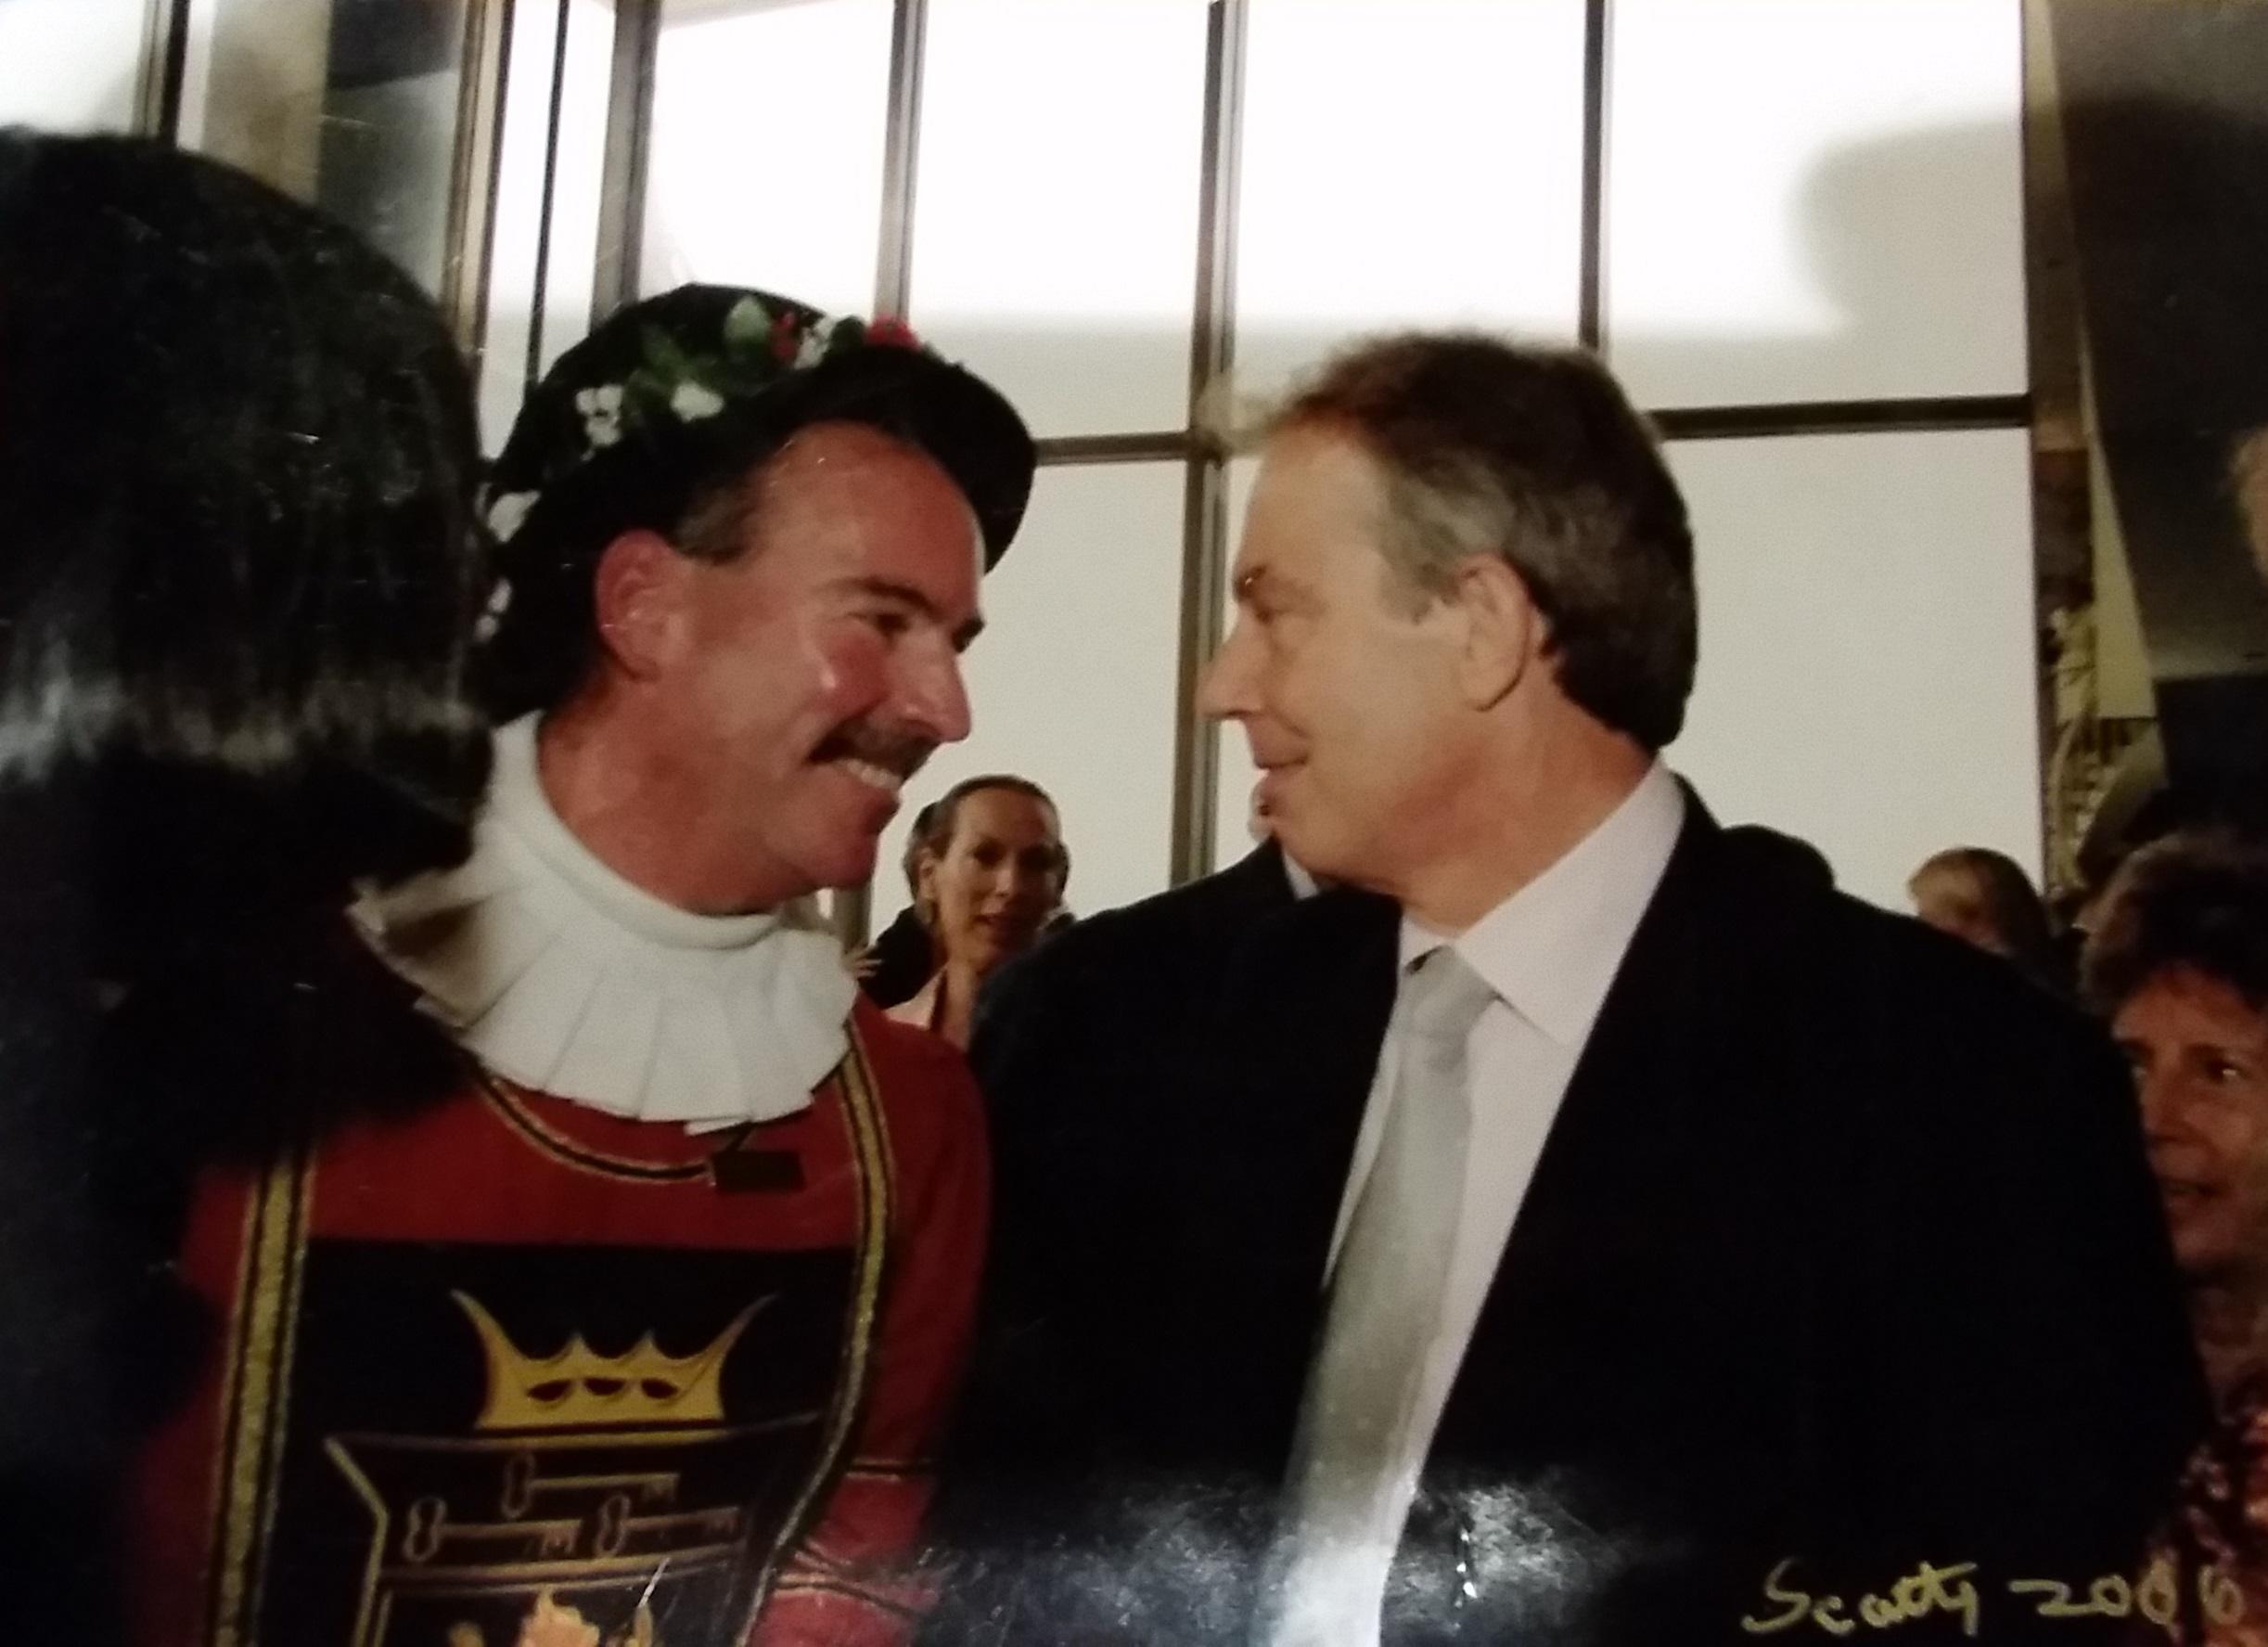 Tom's drinking buddy, Tony Blair